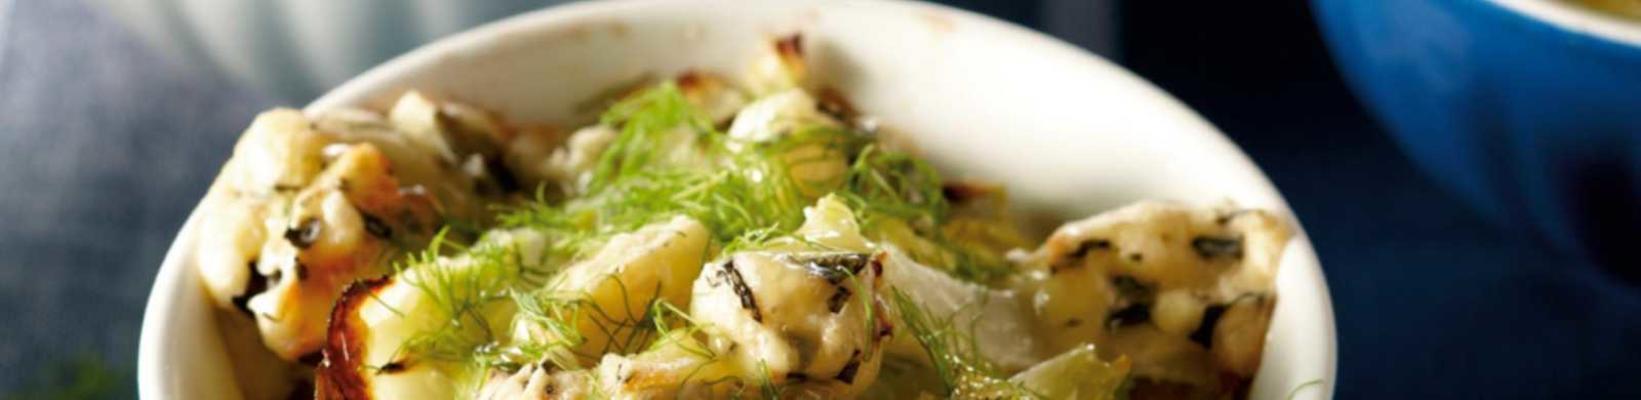 scalloped fennel cabbage dish